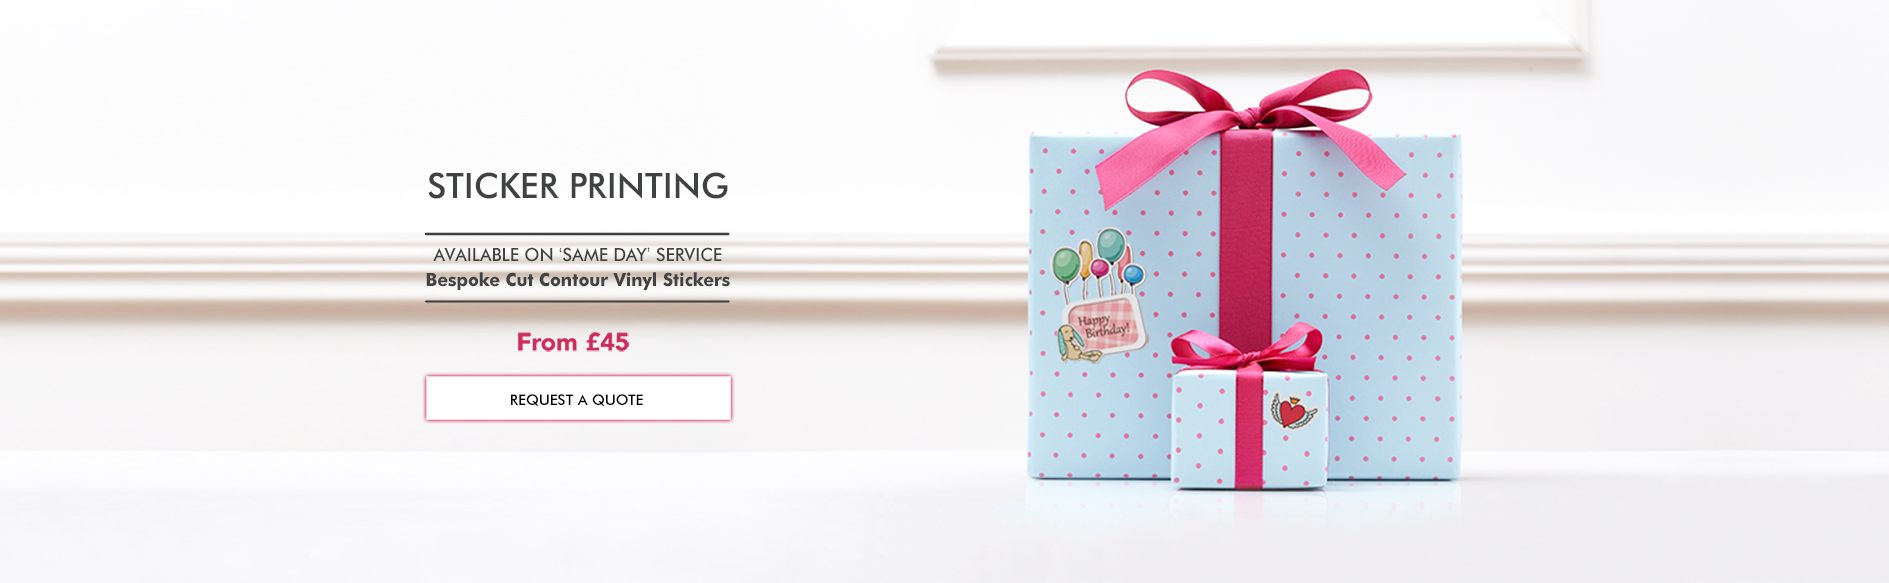 Sticker-Printing_Slider.1